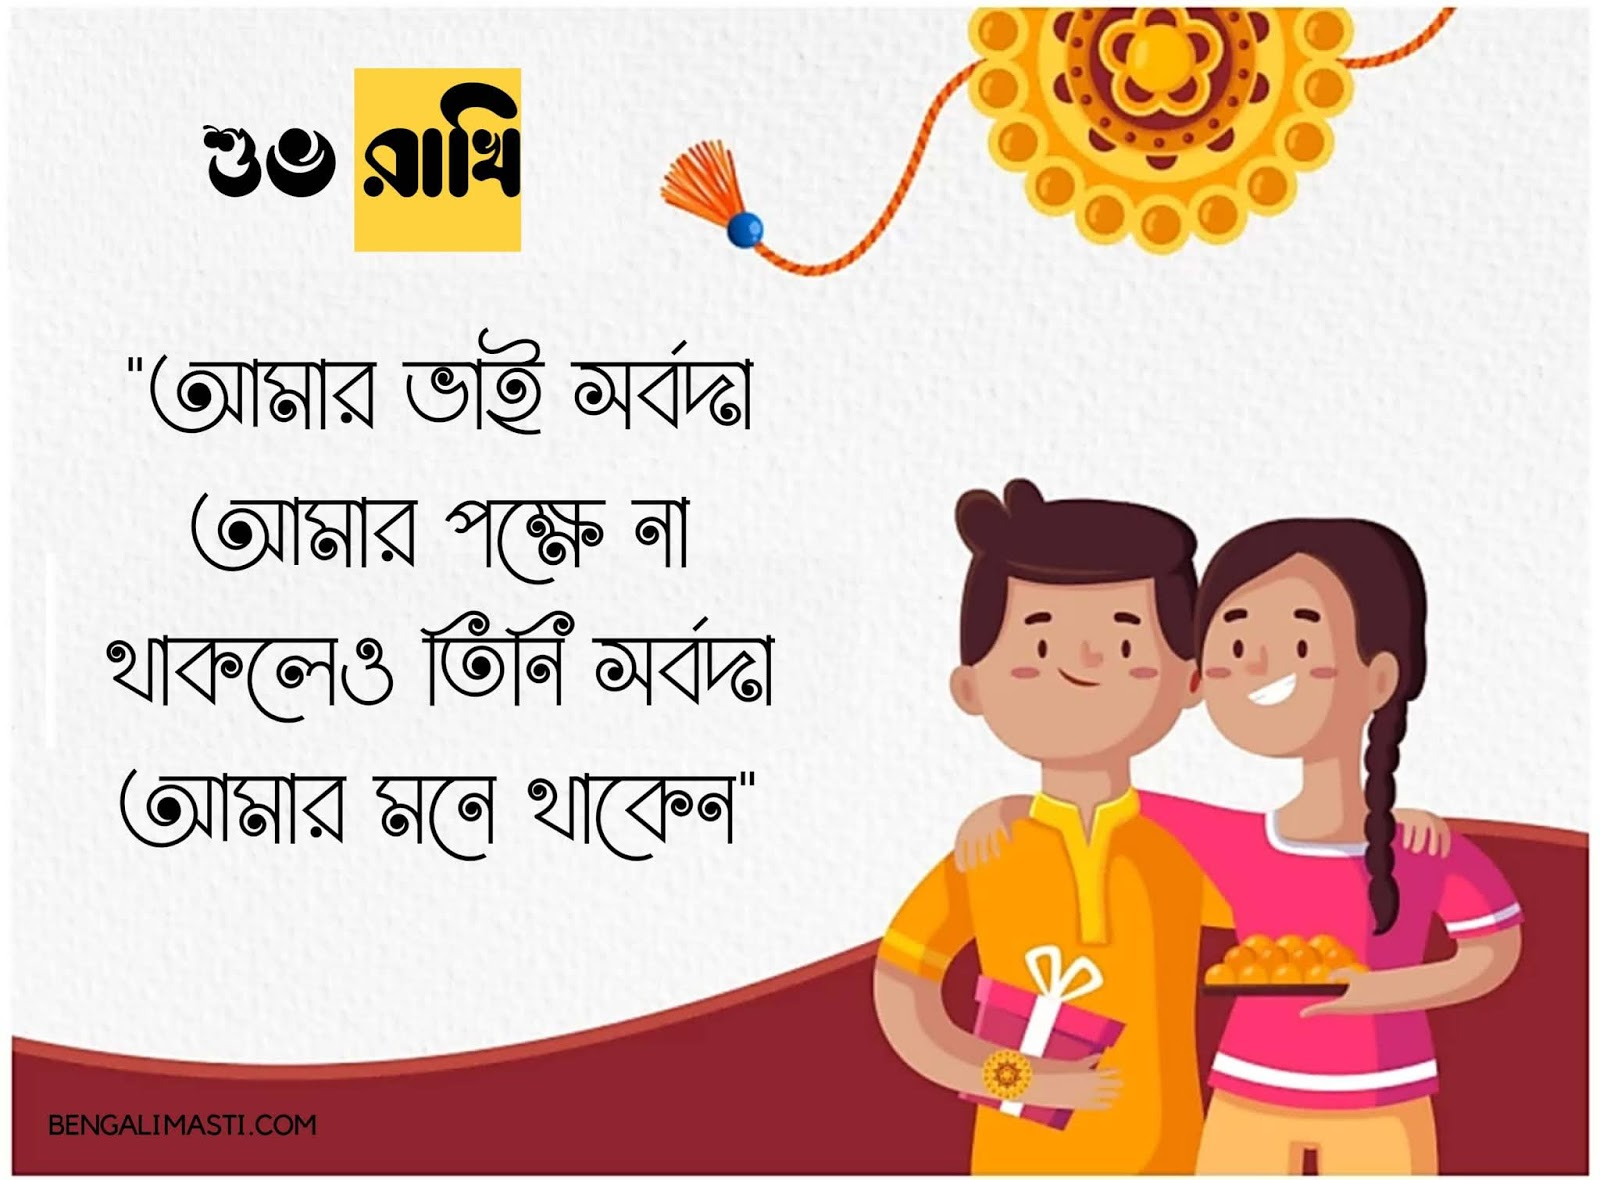 Happy Raksha Bandhan in bengali